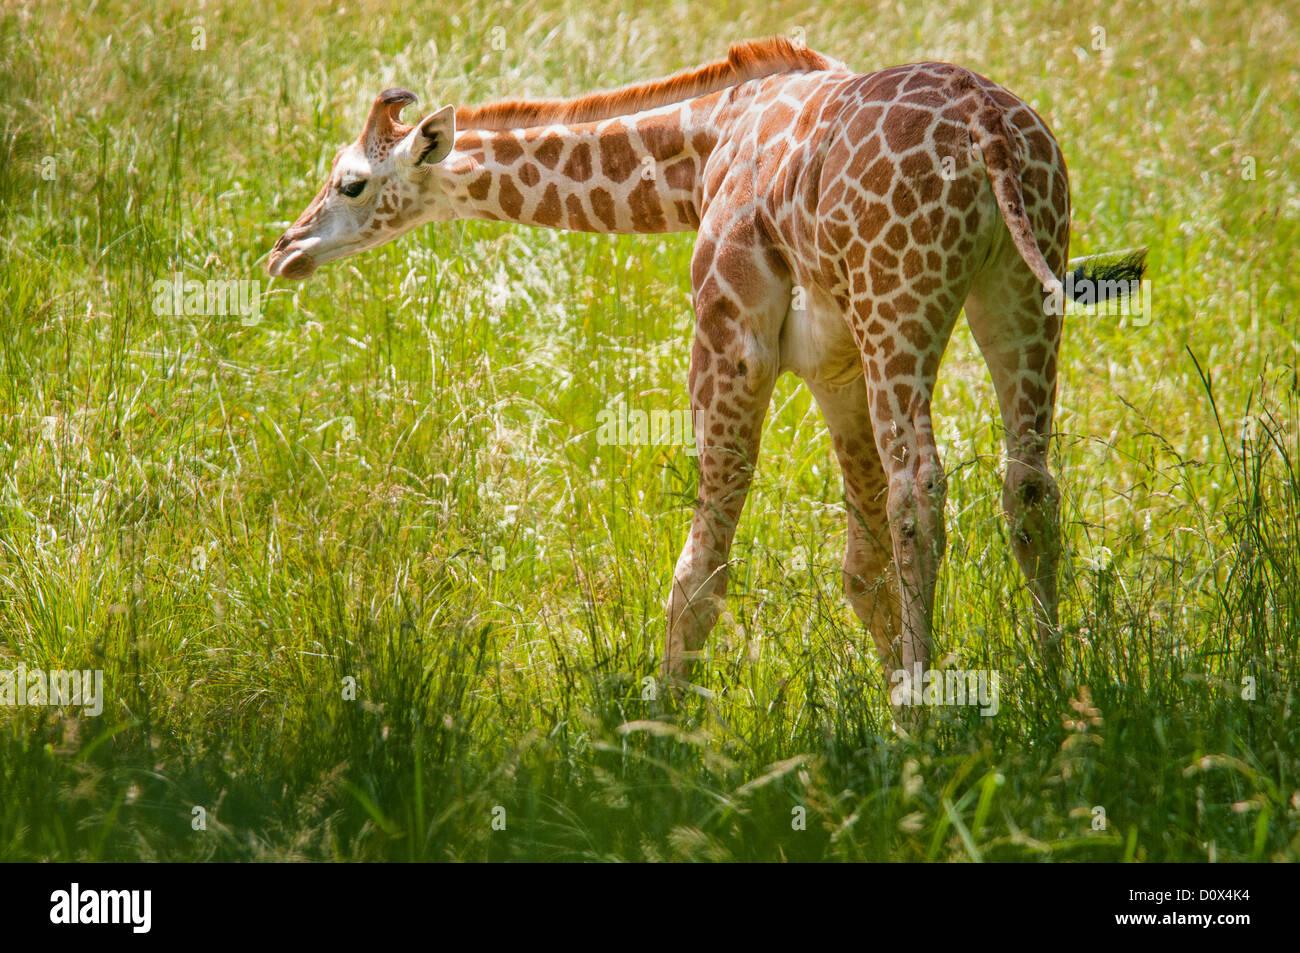 Baringo or Rothschild's Giraffe Calf, Giraffa camelopardalis rothschildi, Bronx Zoo, New York, USA Stock Photo